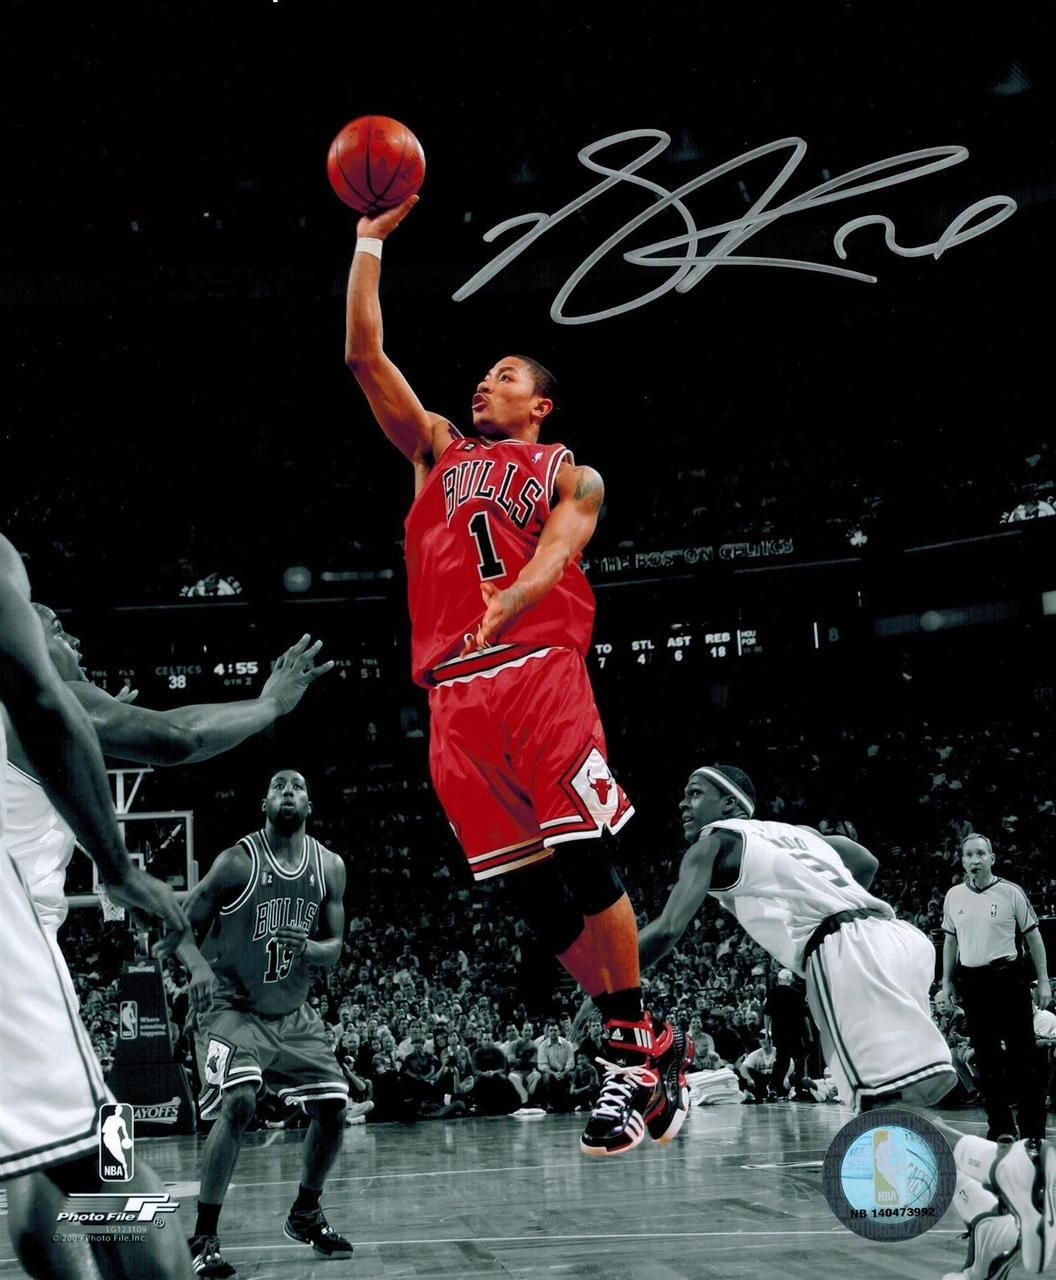 Derrick Rose Signed Chicago Bulls Red Jersey Action 8x10 Photo Chicago Bulls Derrick Rose 8x10 Photo